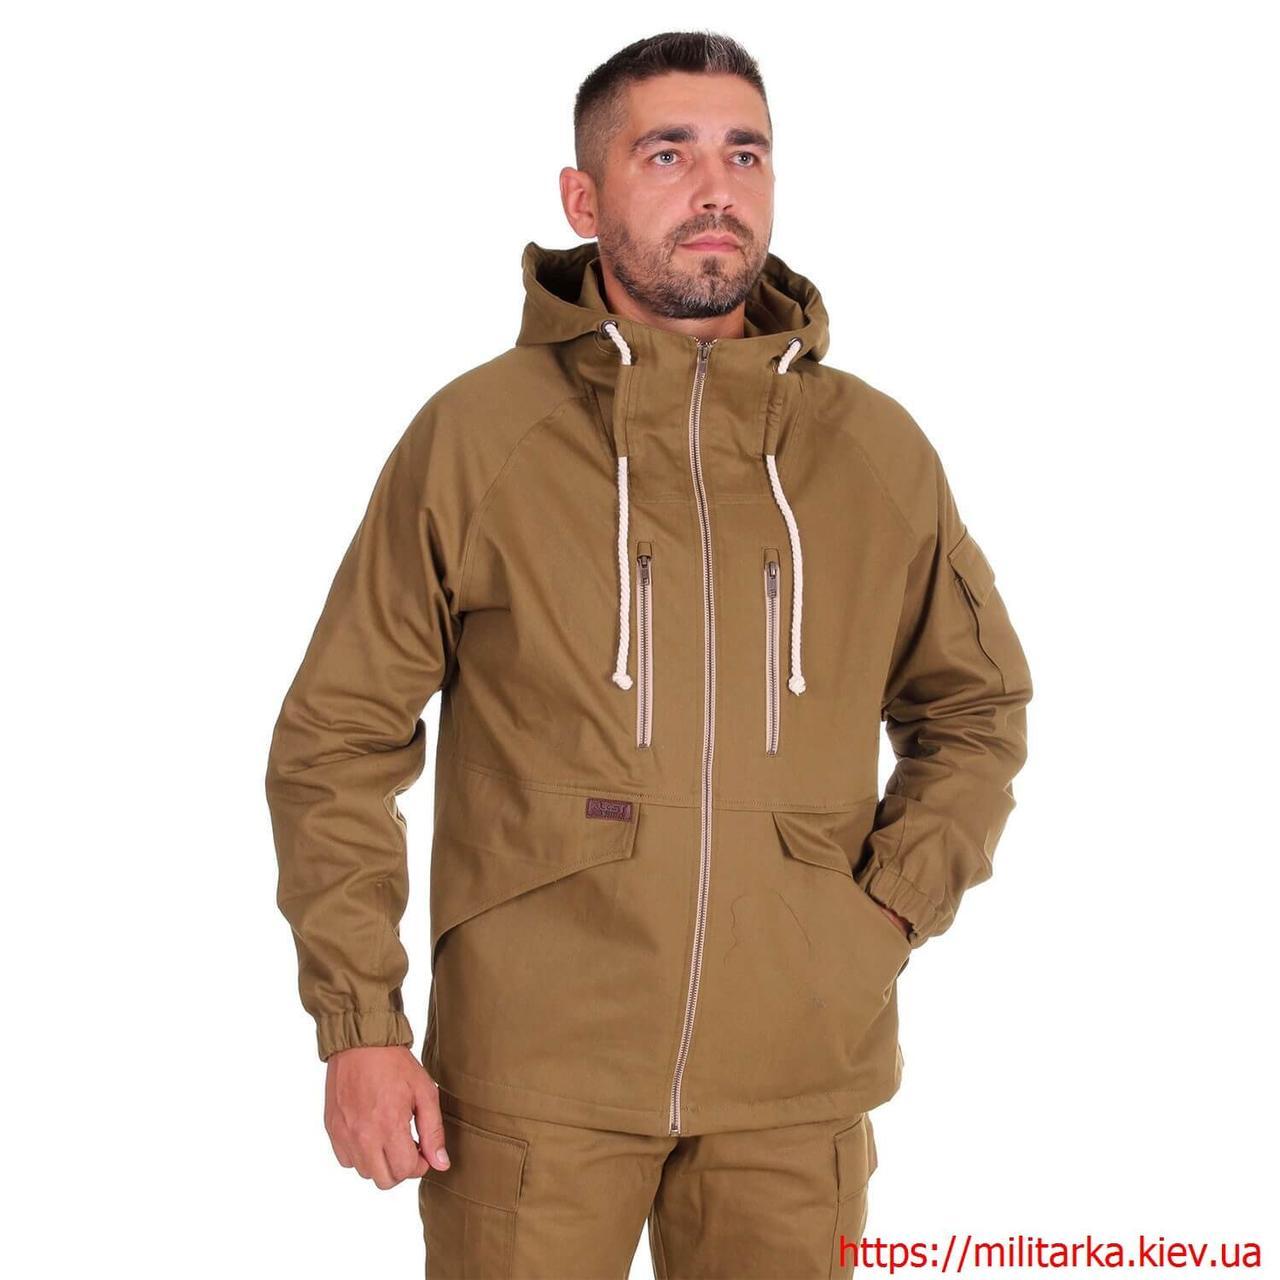 Куртка штормовка KLOST Трофей хаки